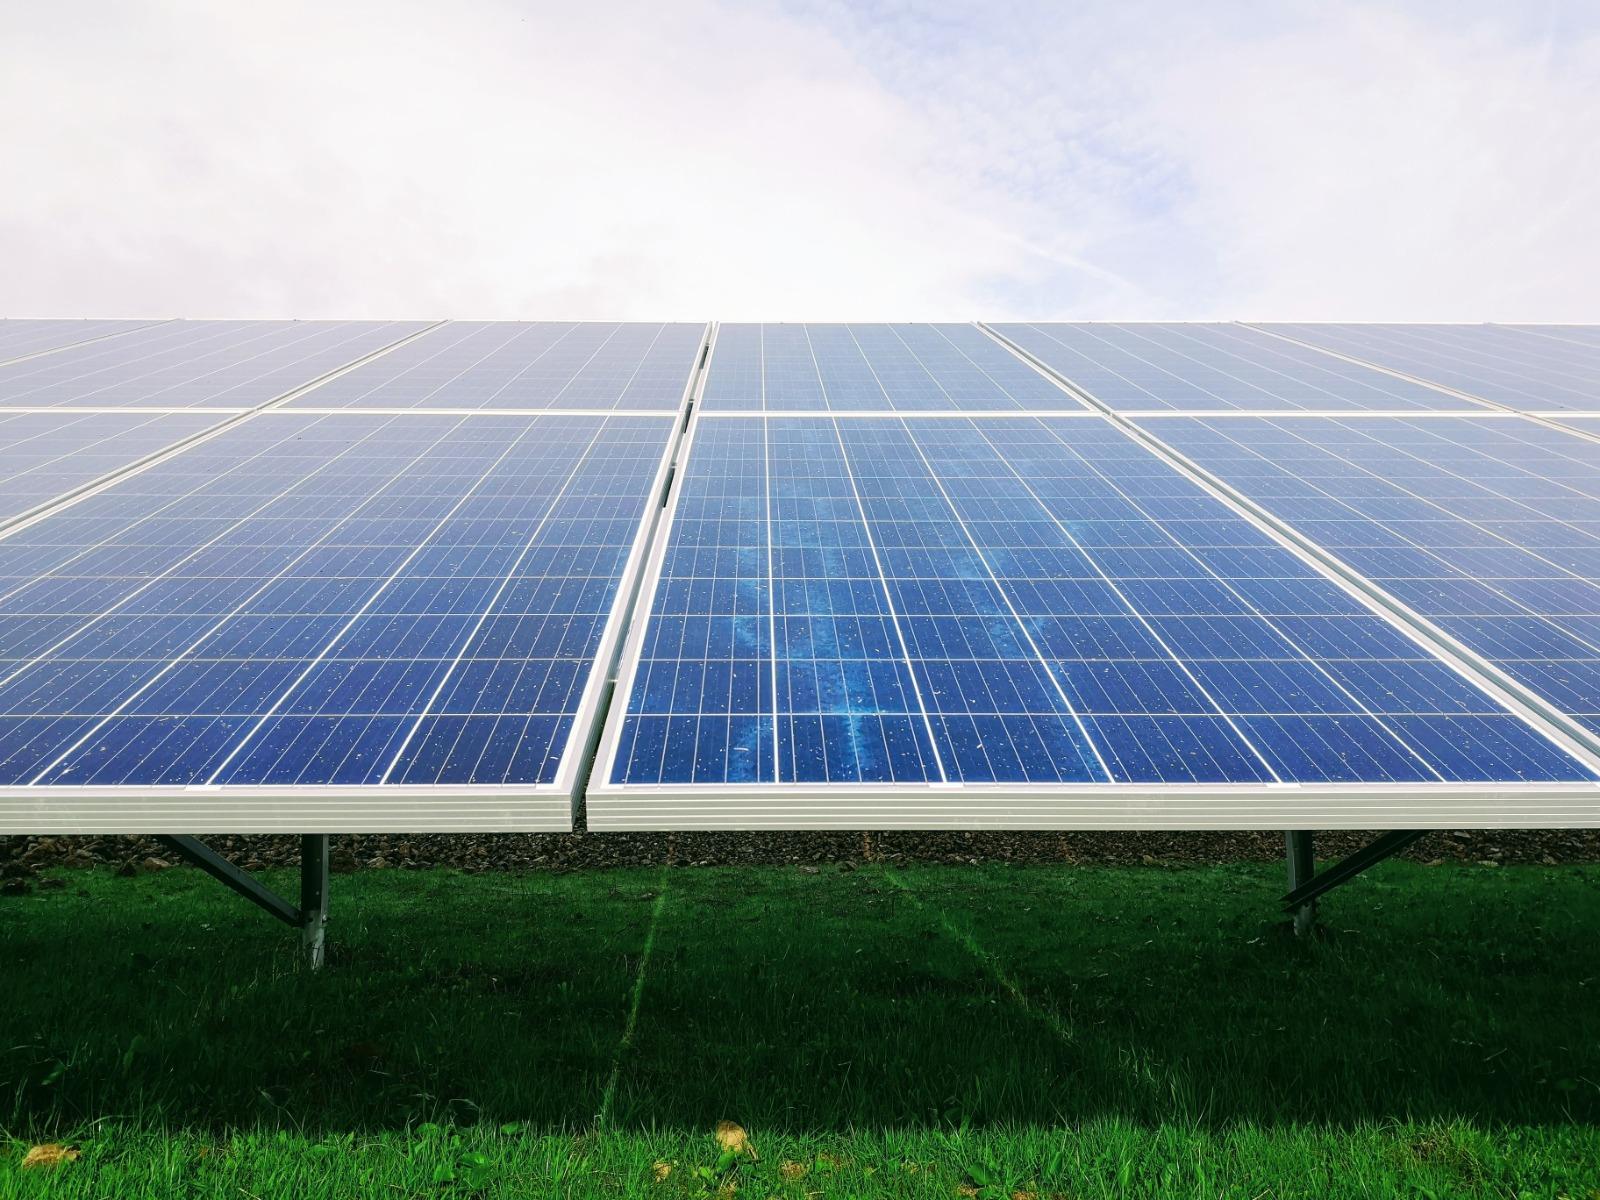 https://universalkraft.com/wp-content/uploads/2021/04/ground-solar-single-universal-kraft.jpeg